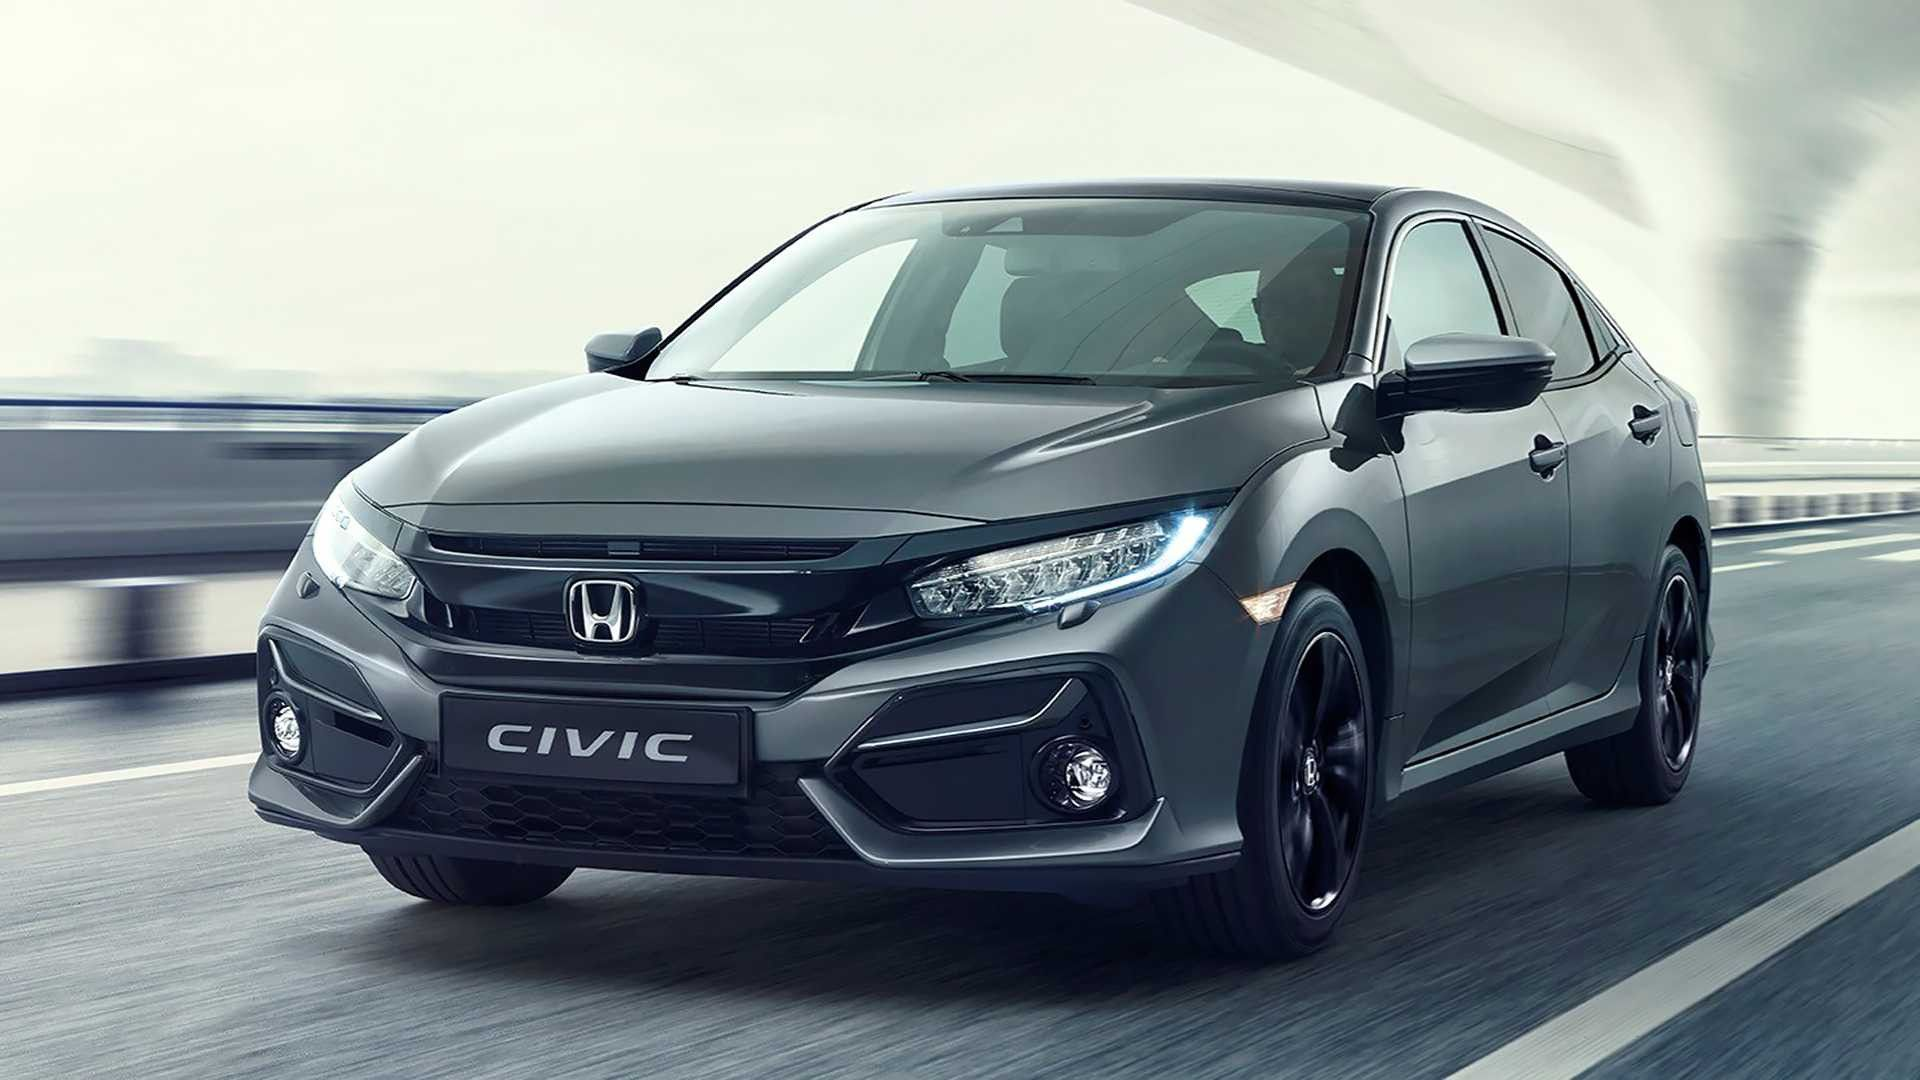 Honda Civic 2020 Review and Specs Check more at http